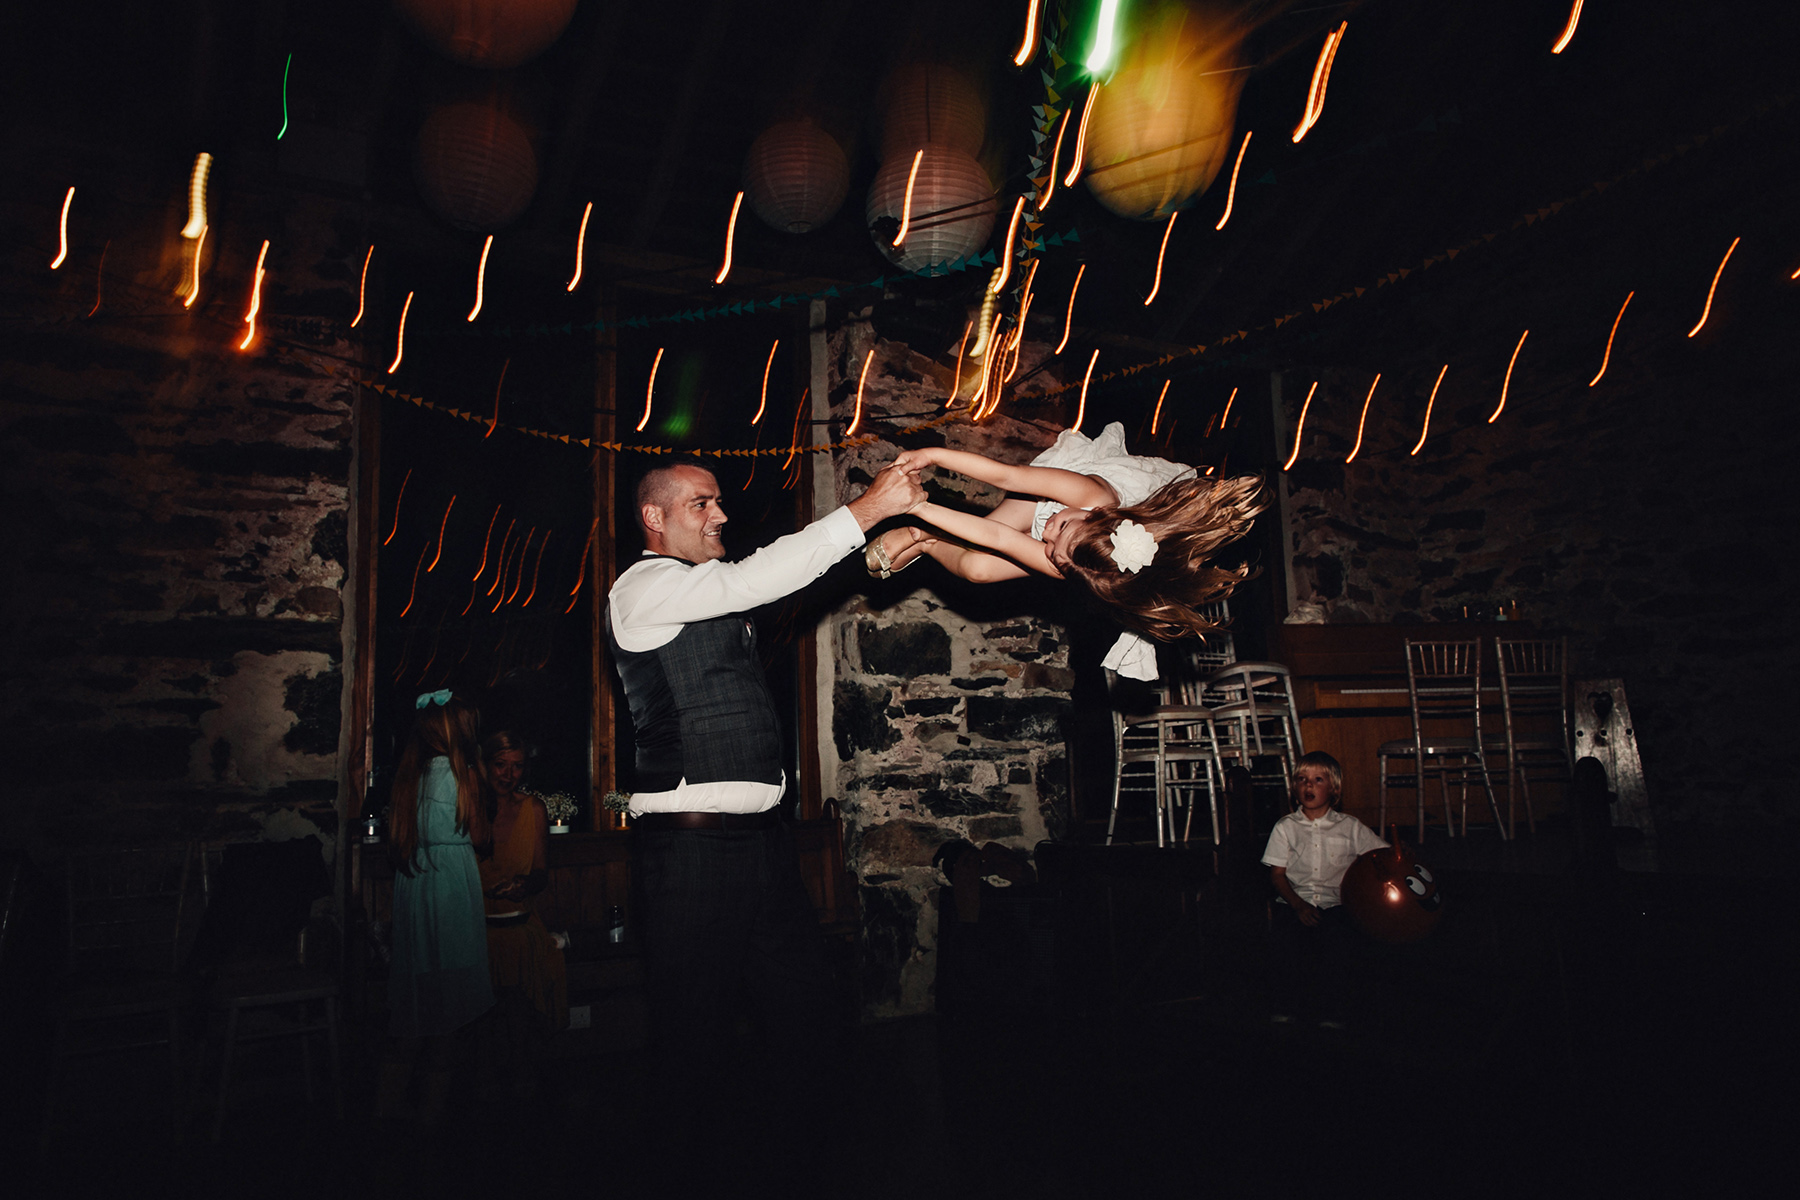 Snowdonia-Wales-Wedding-Photos-0413.jpg